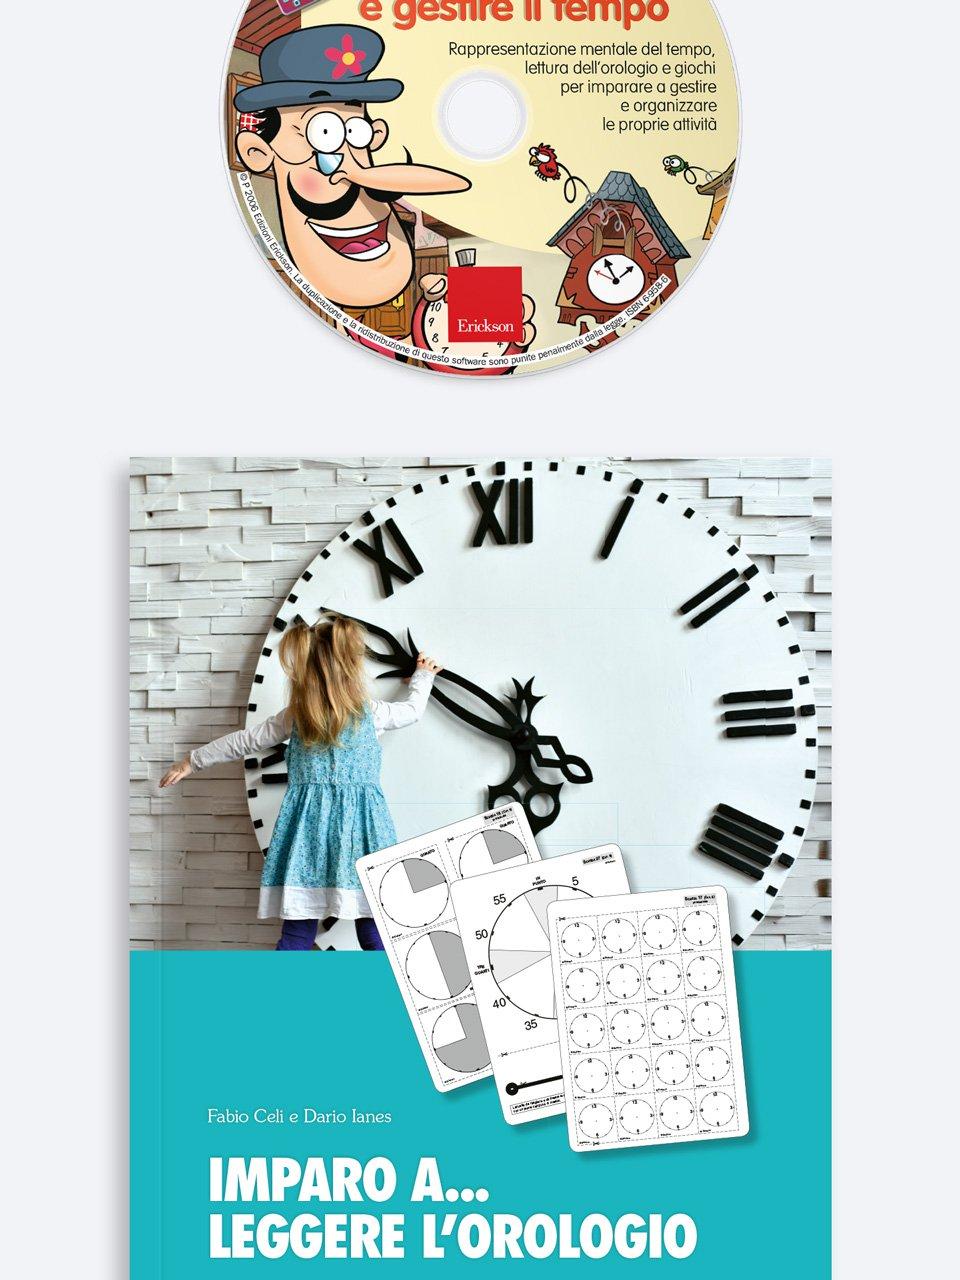 Imparo a... leggere l'orologio - Dario Ianes - Erickson 4